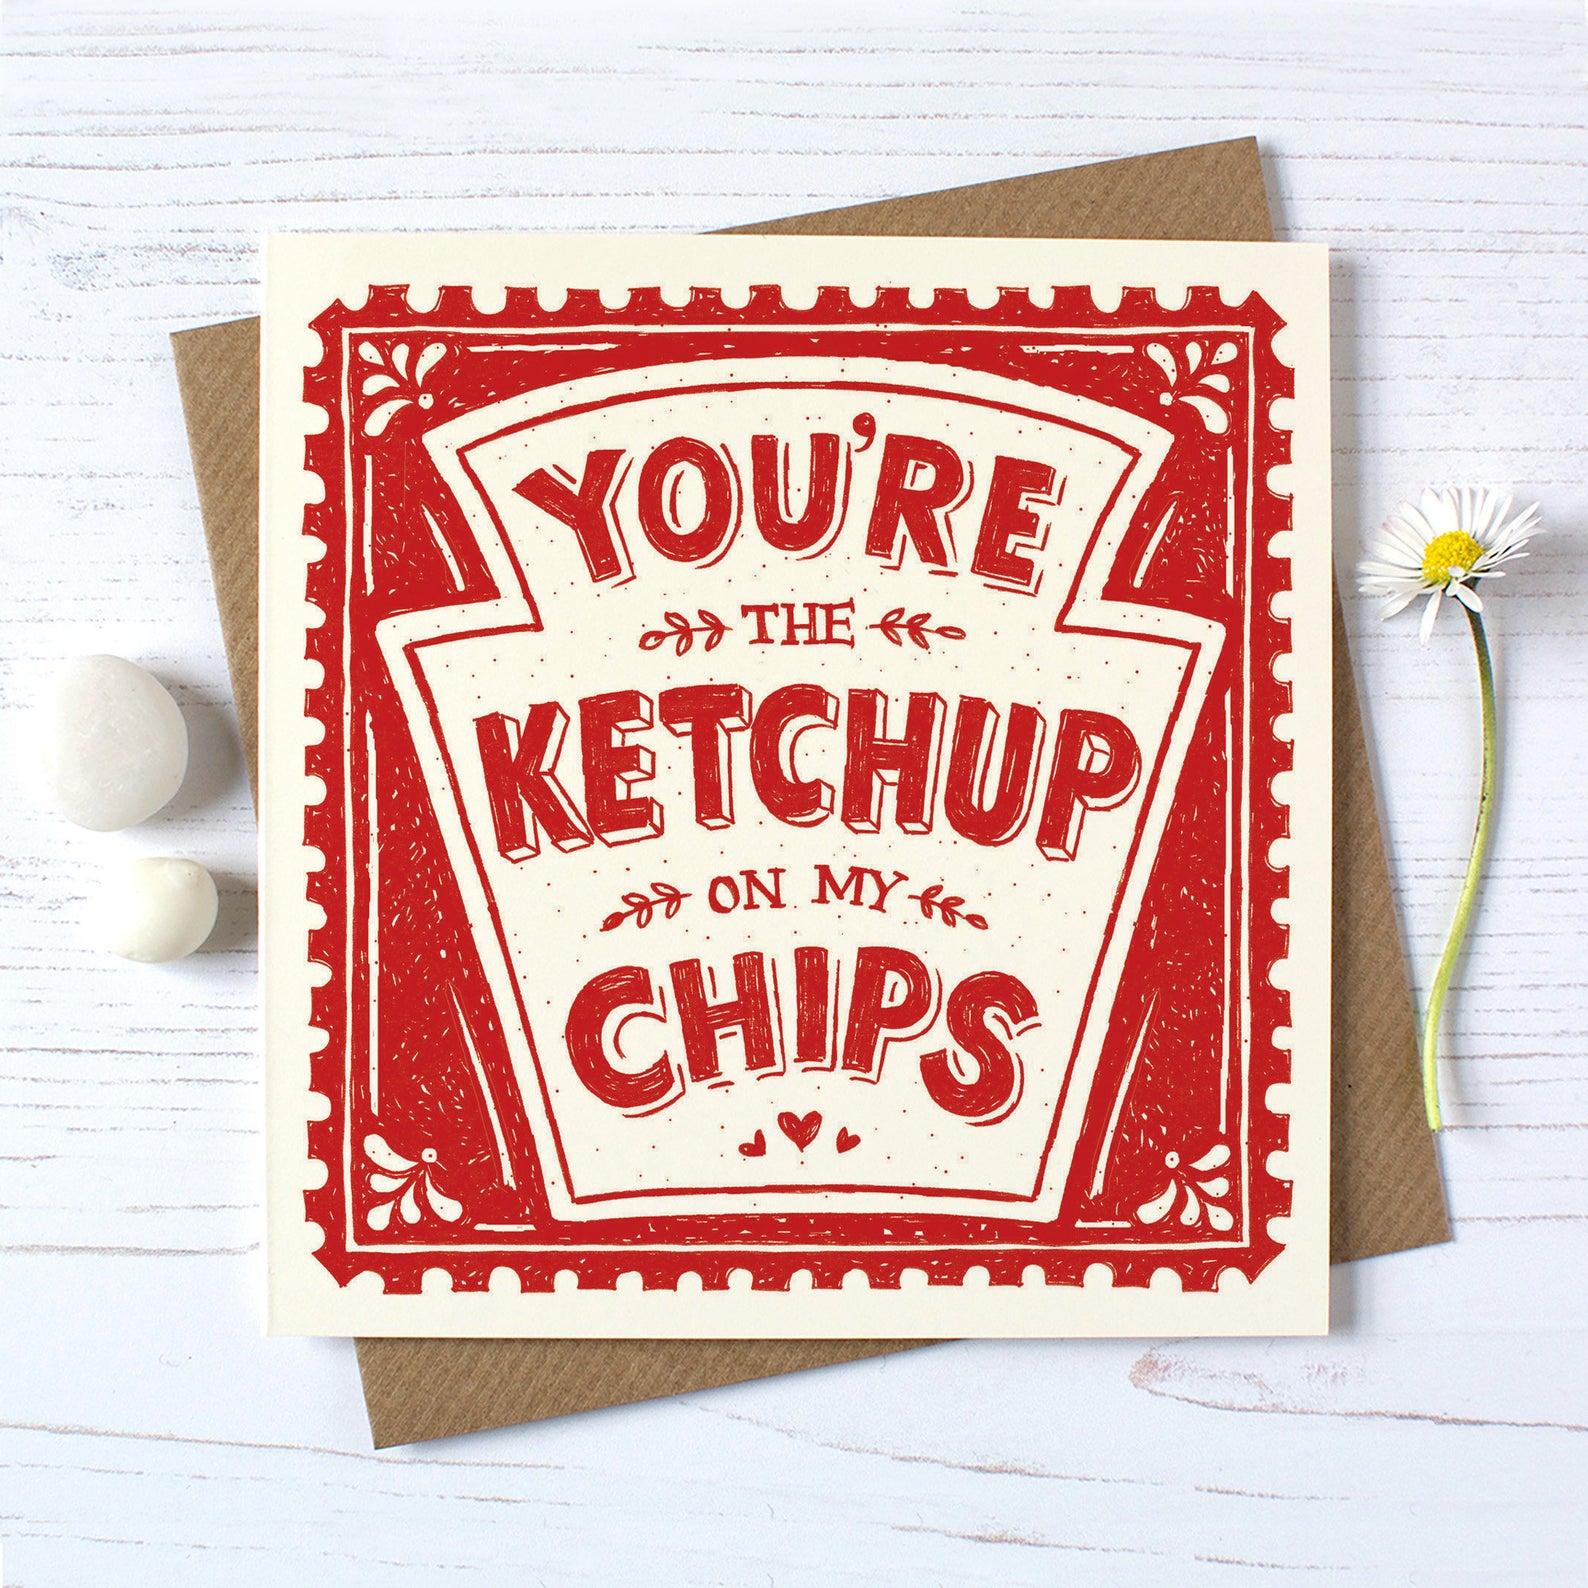 Alexandra Snowdon Ketchup On My Chips Card